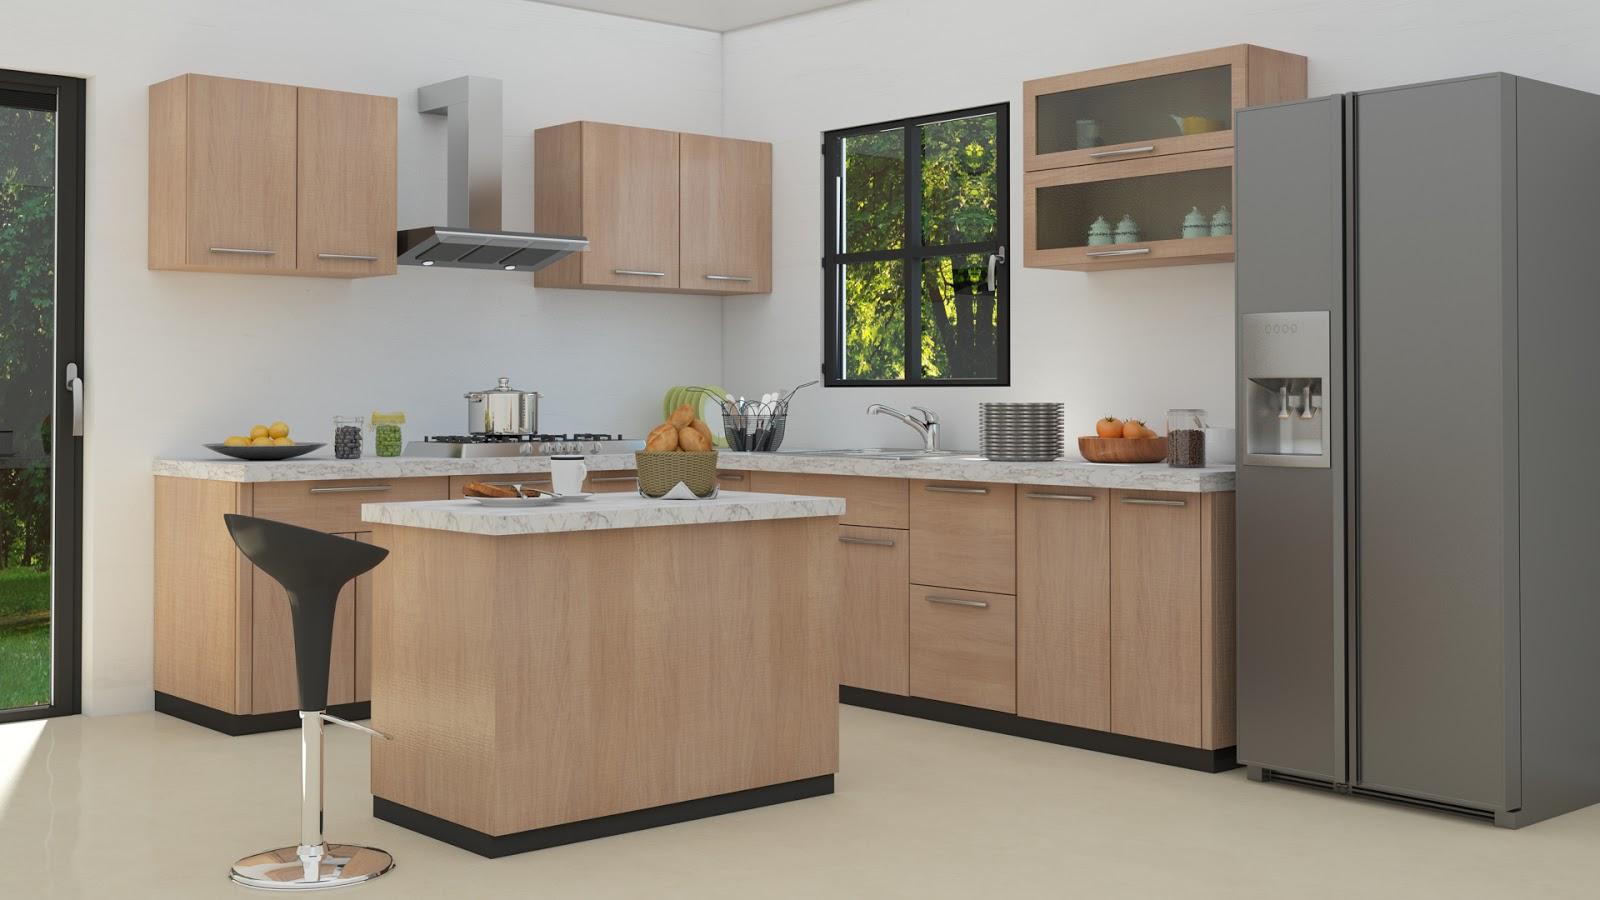 Design ideas for L shaped kitchens | Interior Decor Blog ...